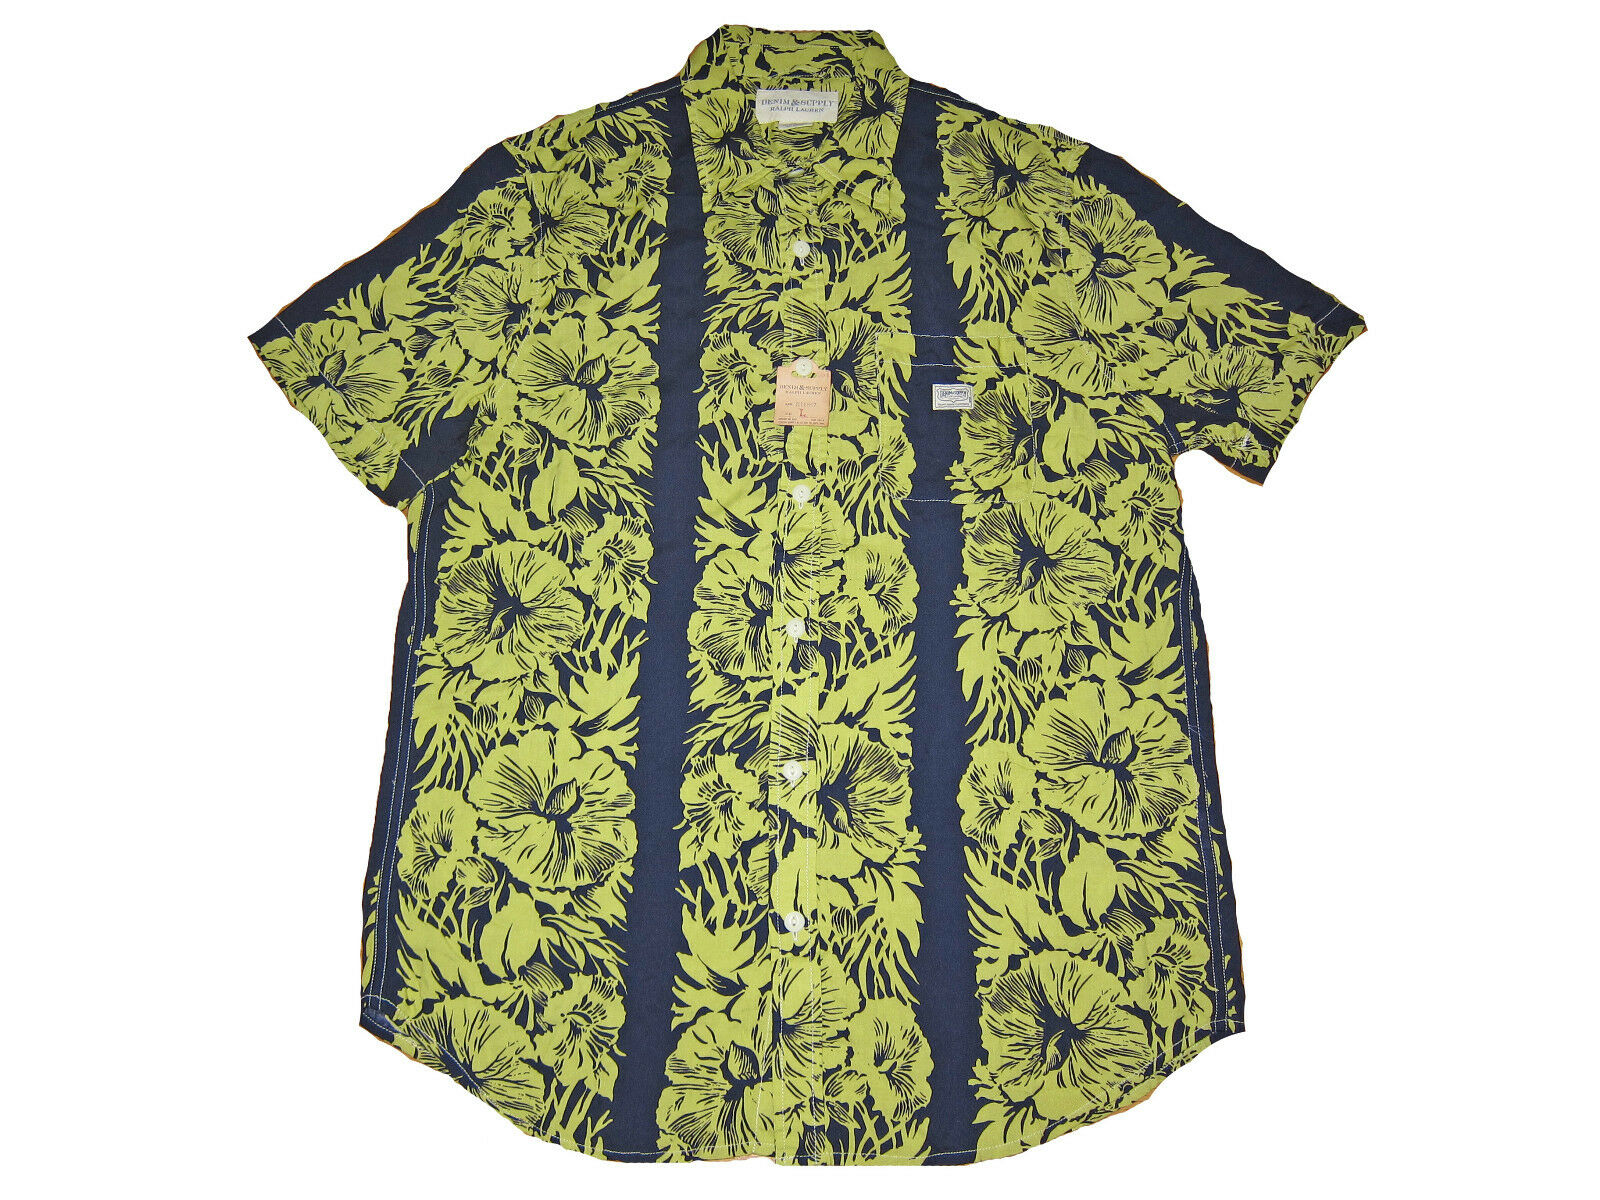 Ralph Lauren Denim and Supply bluee Floral Polo Hawaiian Camp Shirt Large